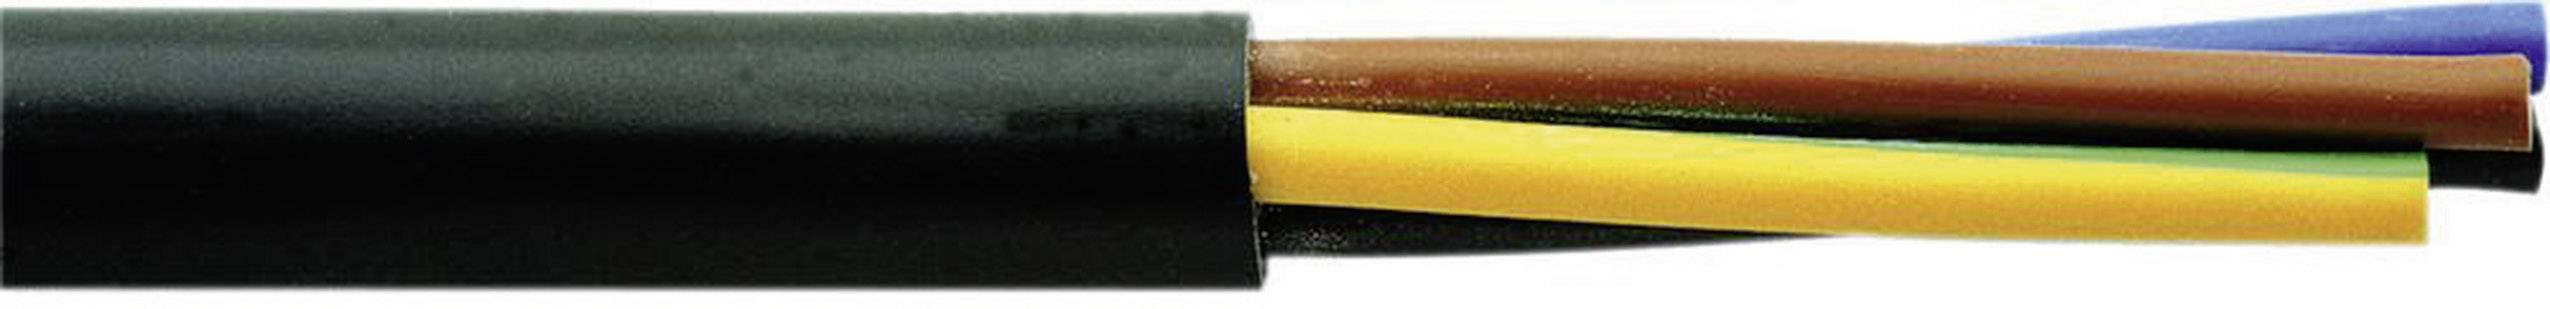 Vícežílový kabel Faber Kabel H03VV-F, 030005, 2 x 0.75 mm², bílá, 100 m